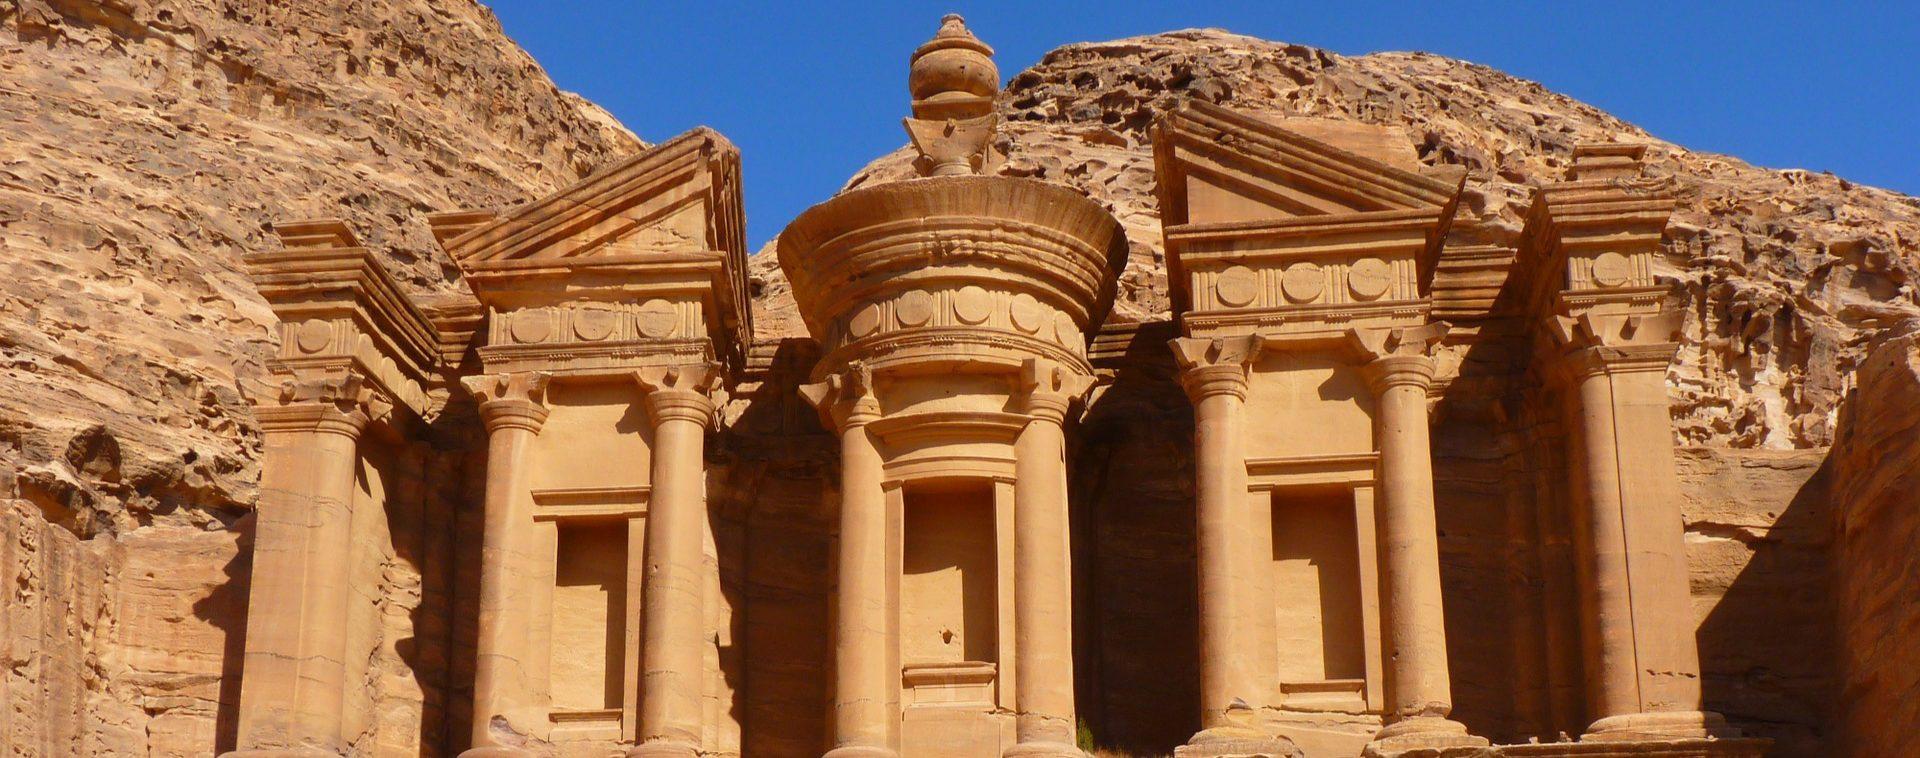 Jordanie - Escalade au Wadi Rum - Les matins du monde